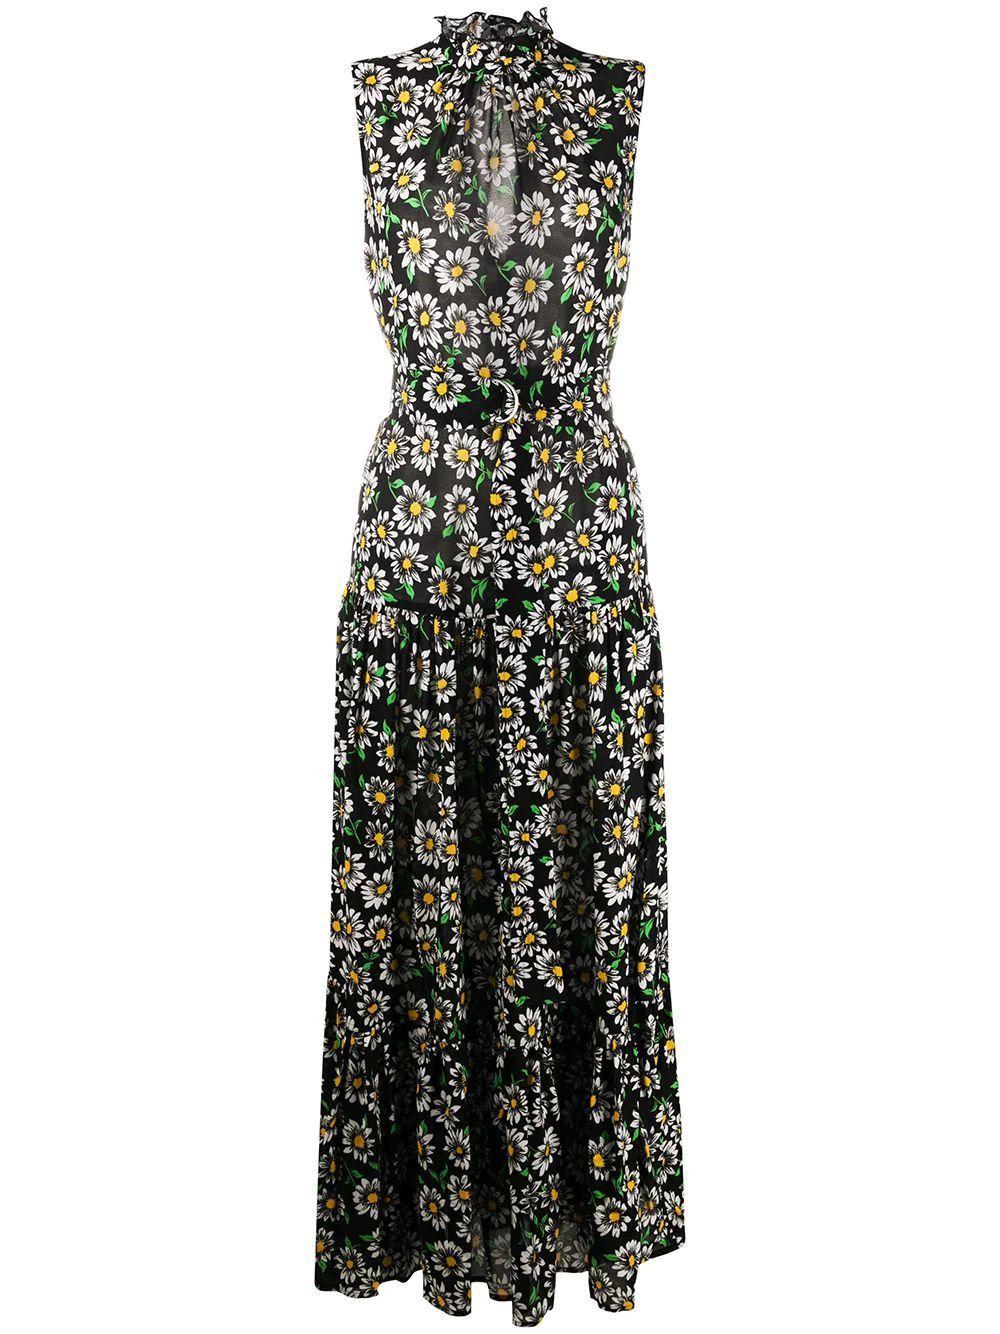 Sleeveless Daisy Print Maxi Dress Item # 2DG00261-2W0035